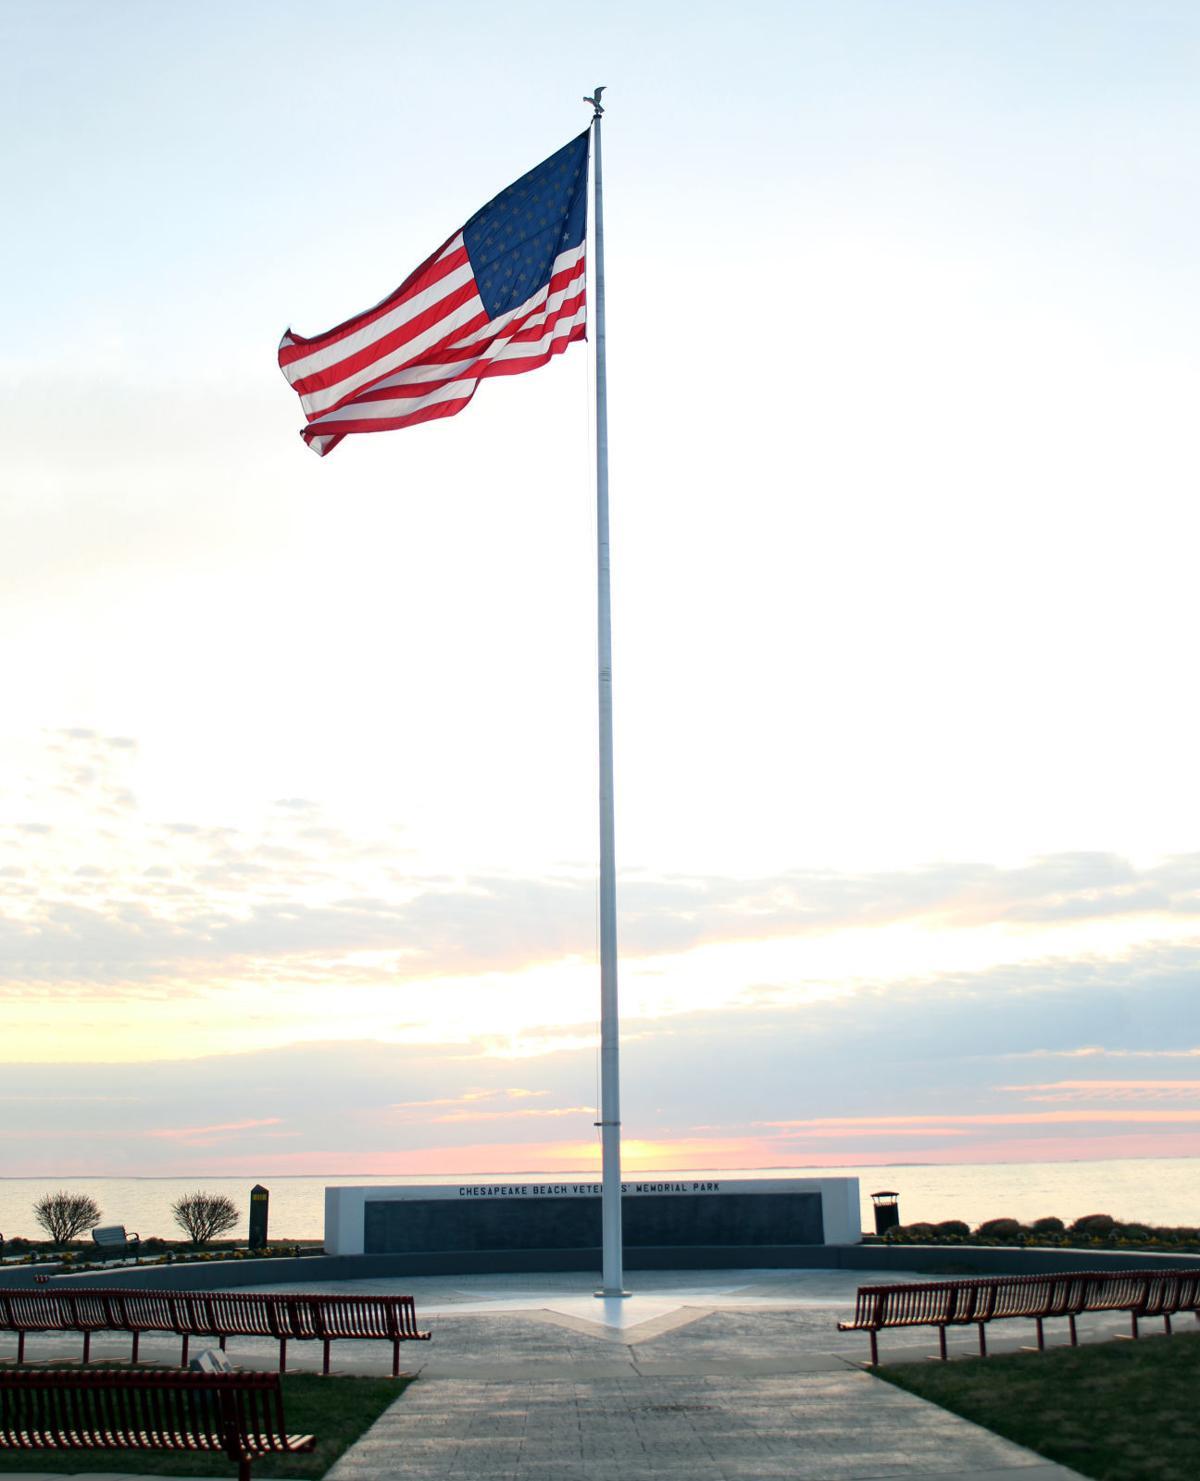 Chesapeake Beach Veterans' Memorial at sunrise